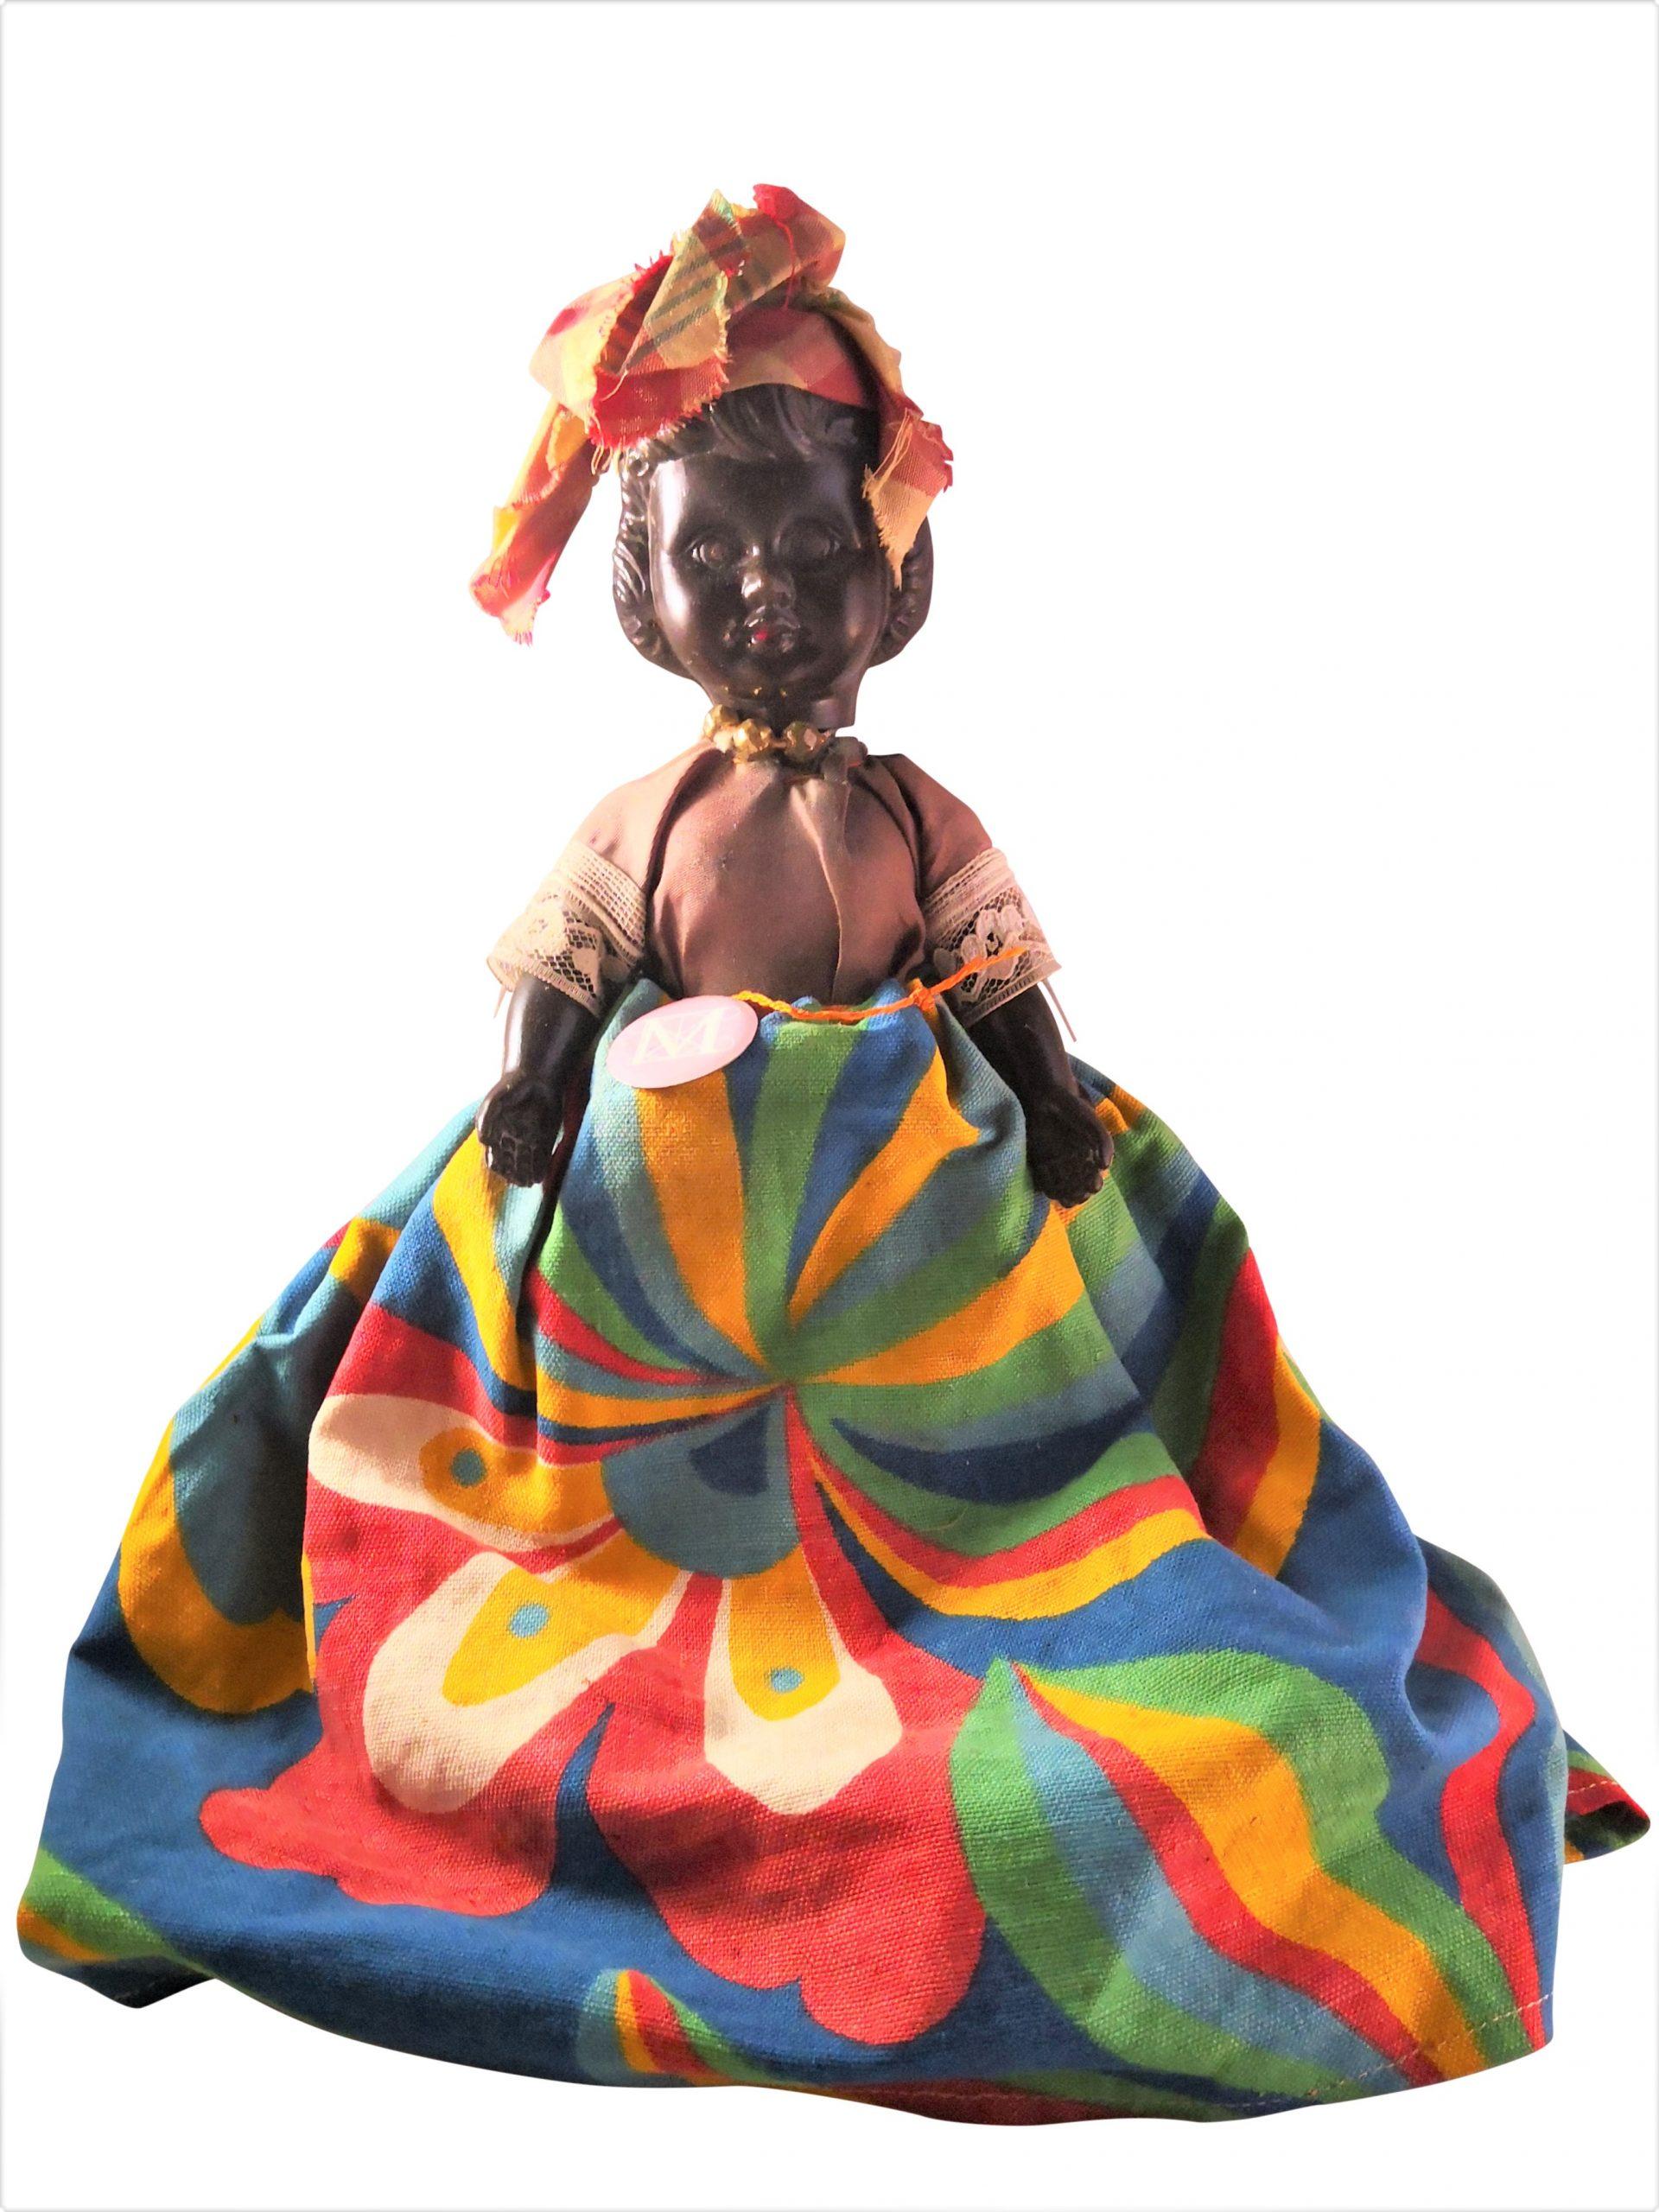 Mid century vintage plastic ethnic African doll from Antik Seramika